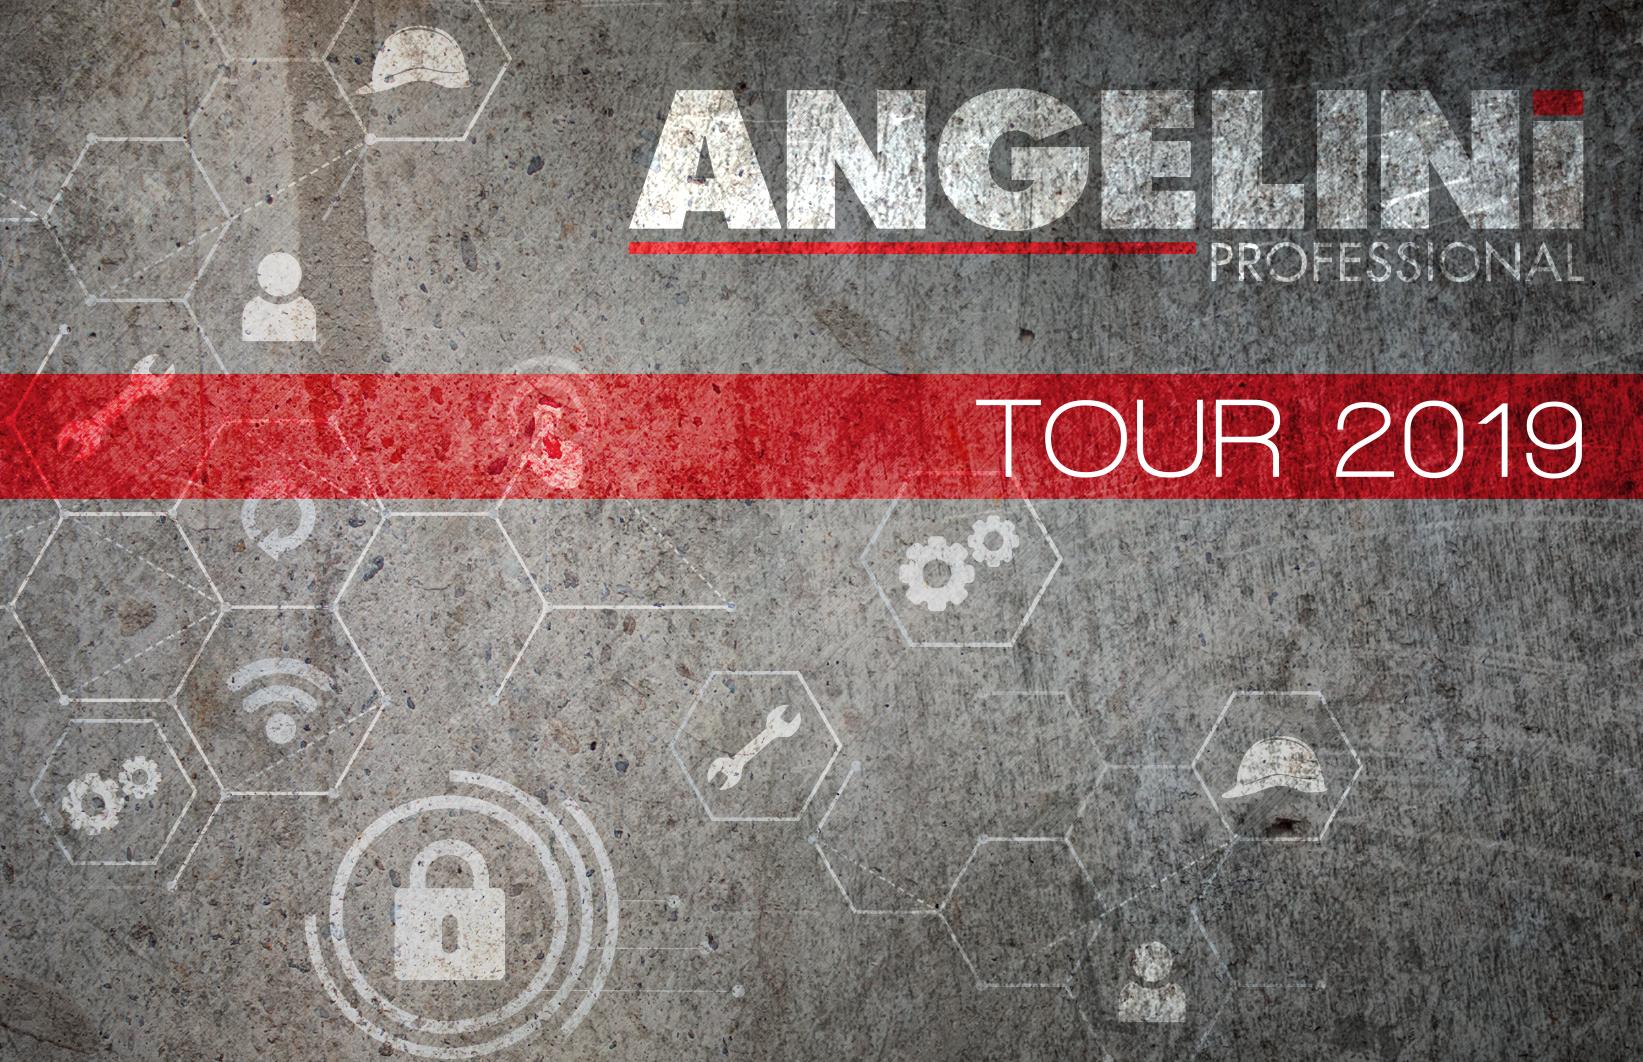 ANGELINI PROFESSIONAL TOUR 2019